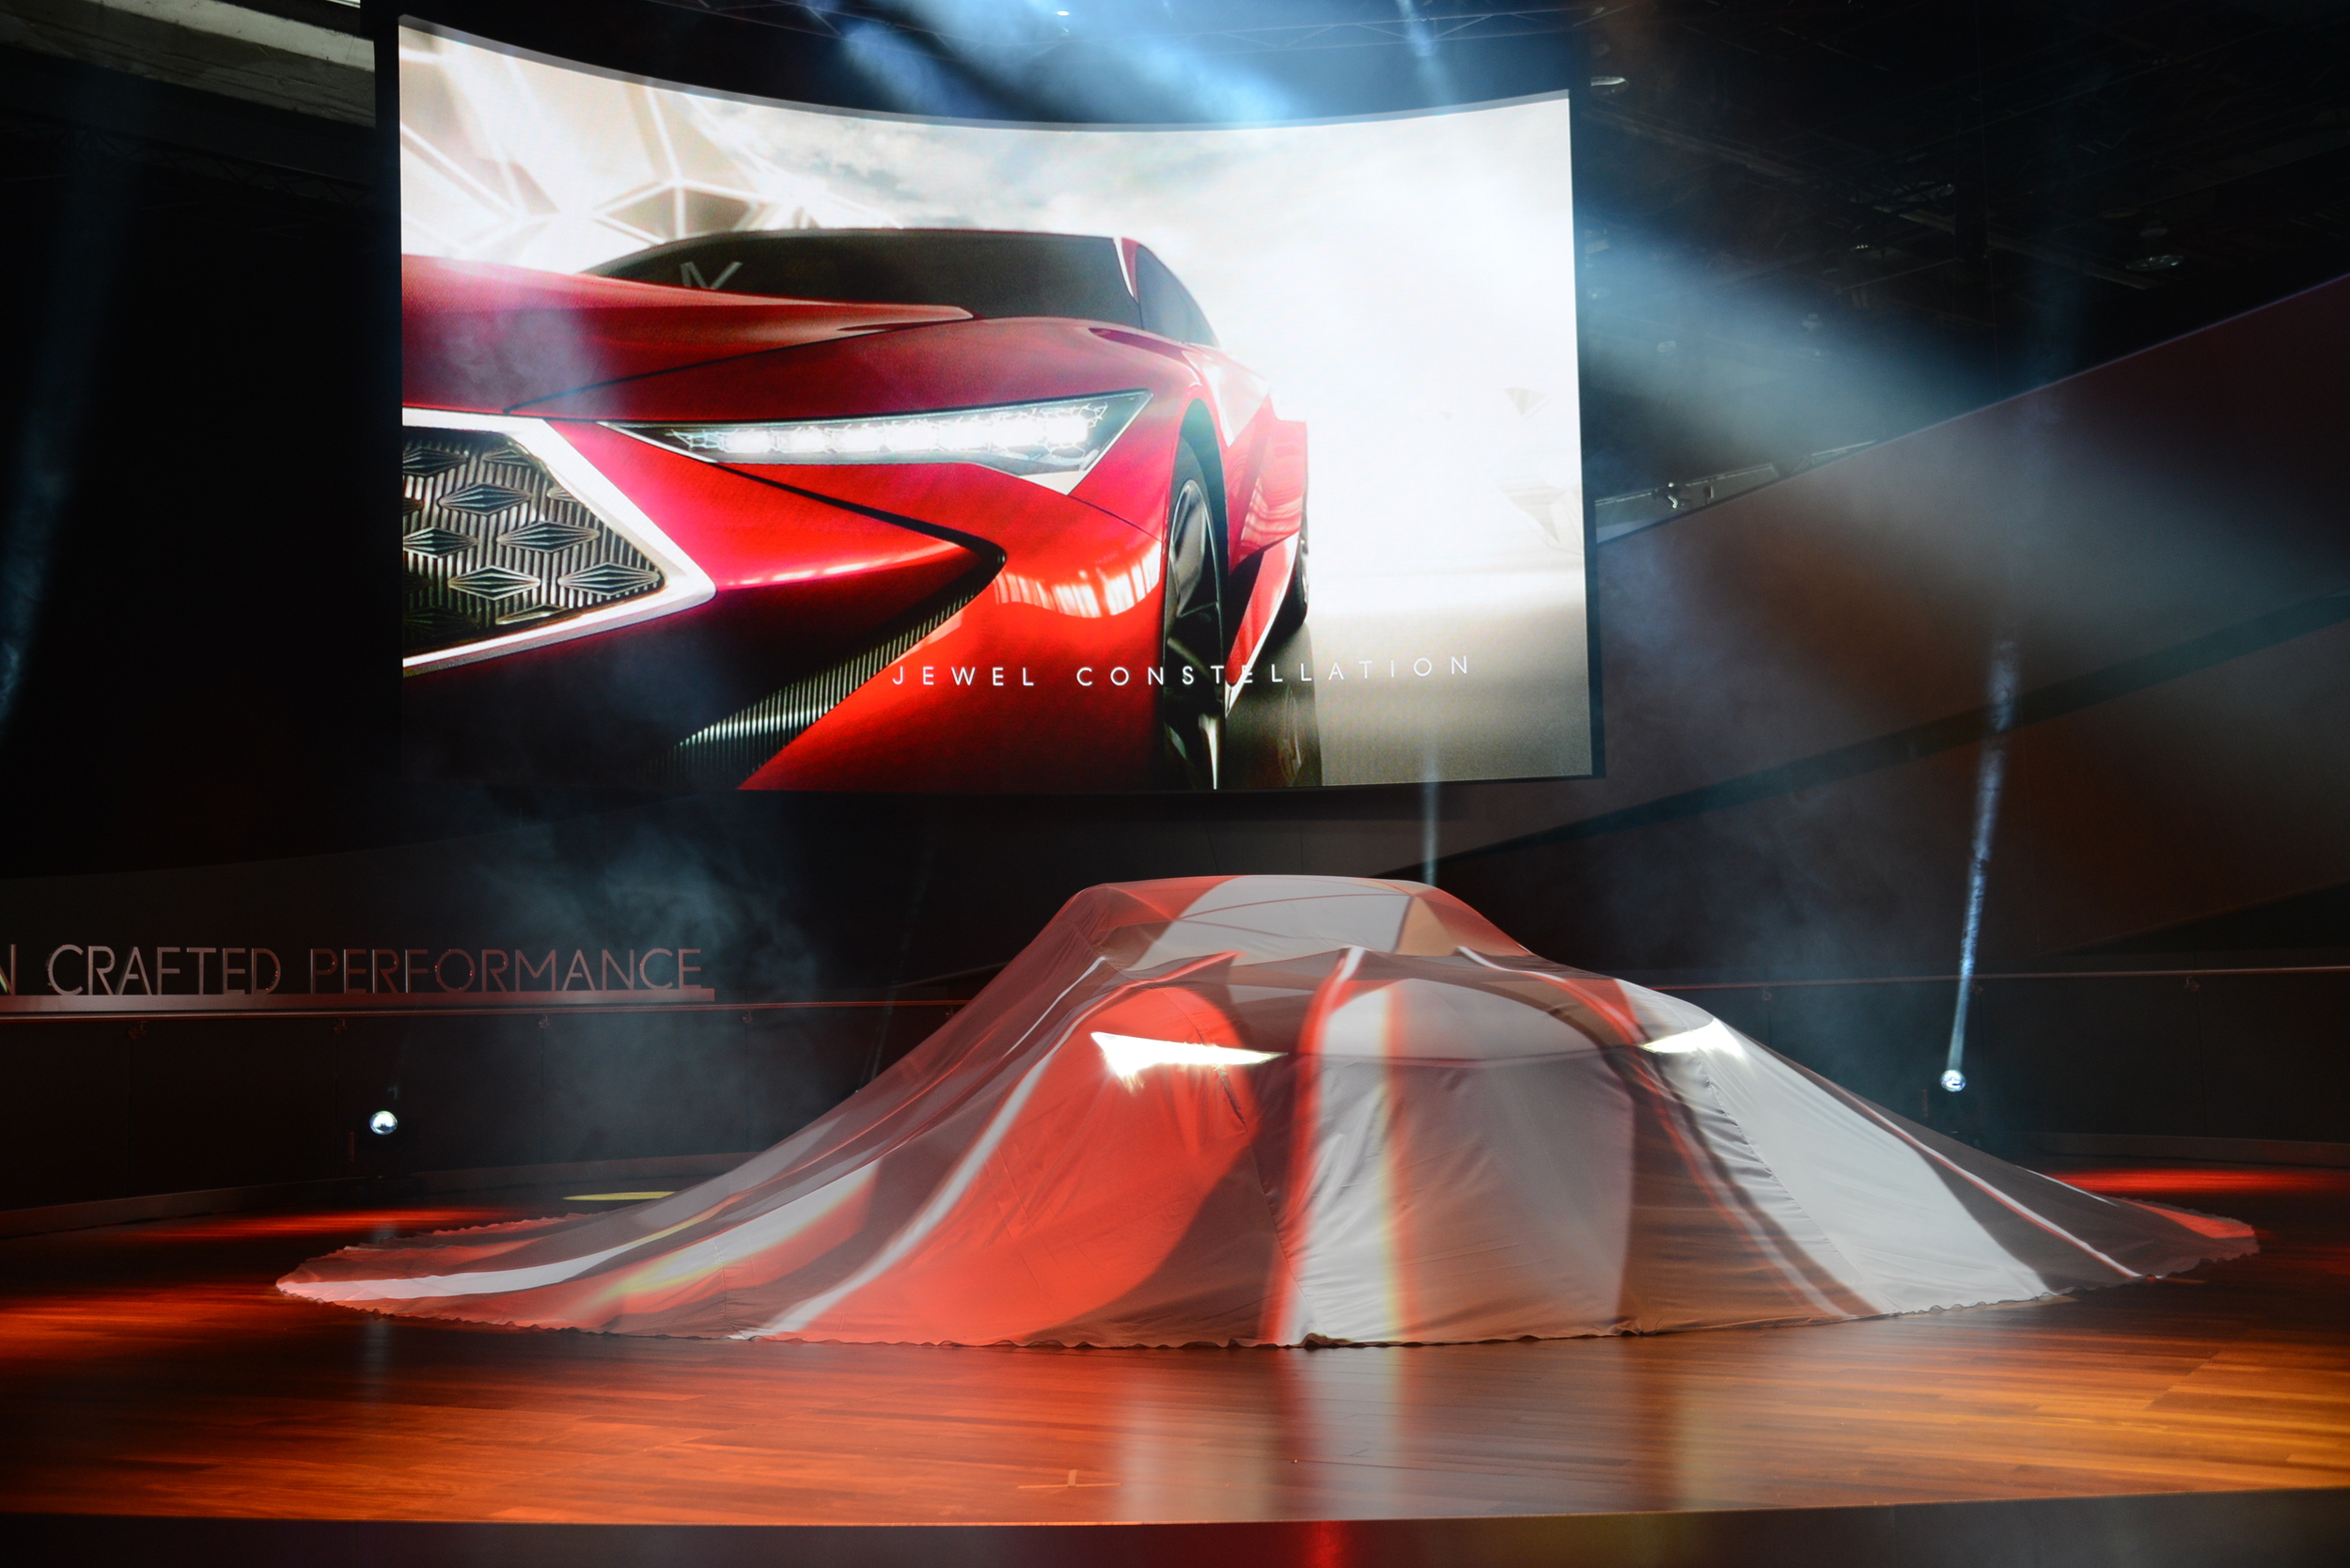 Acura Detroit Press Conference